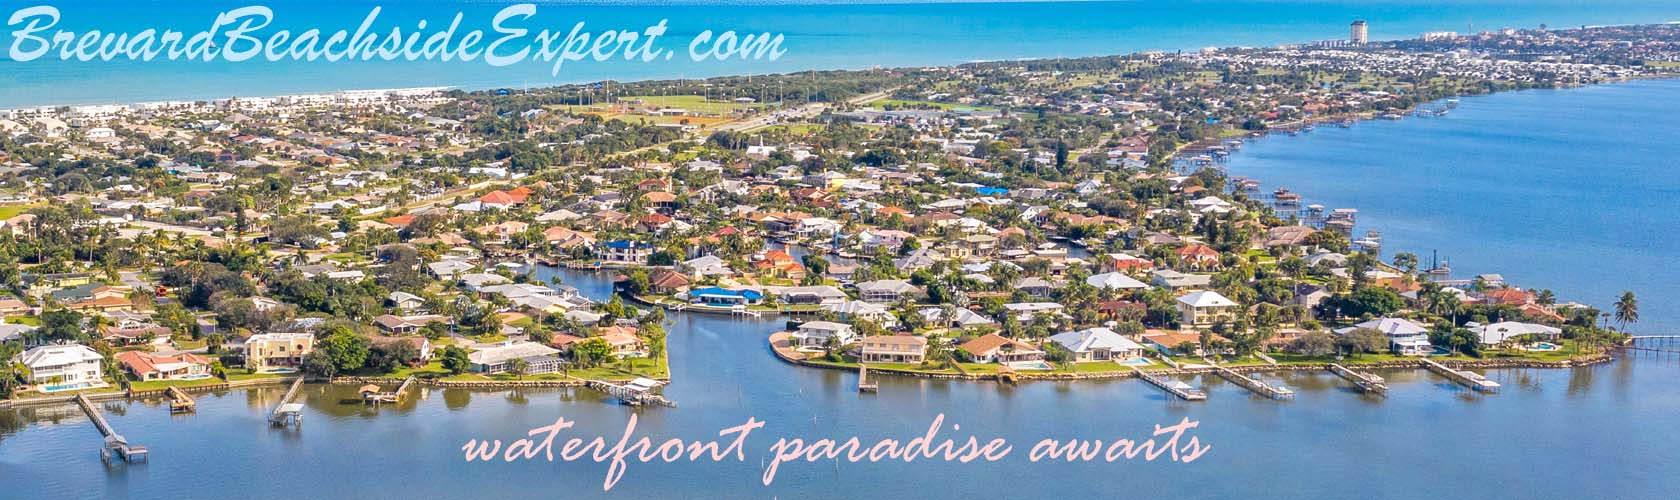 Waterfront Paradise Awaits - Brevard Beachside Expert